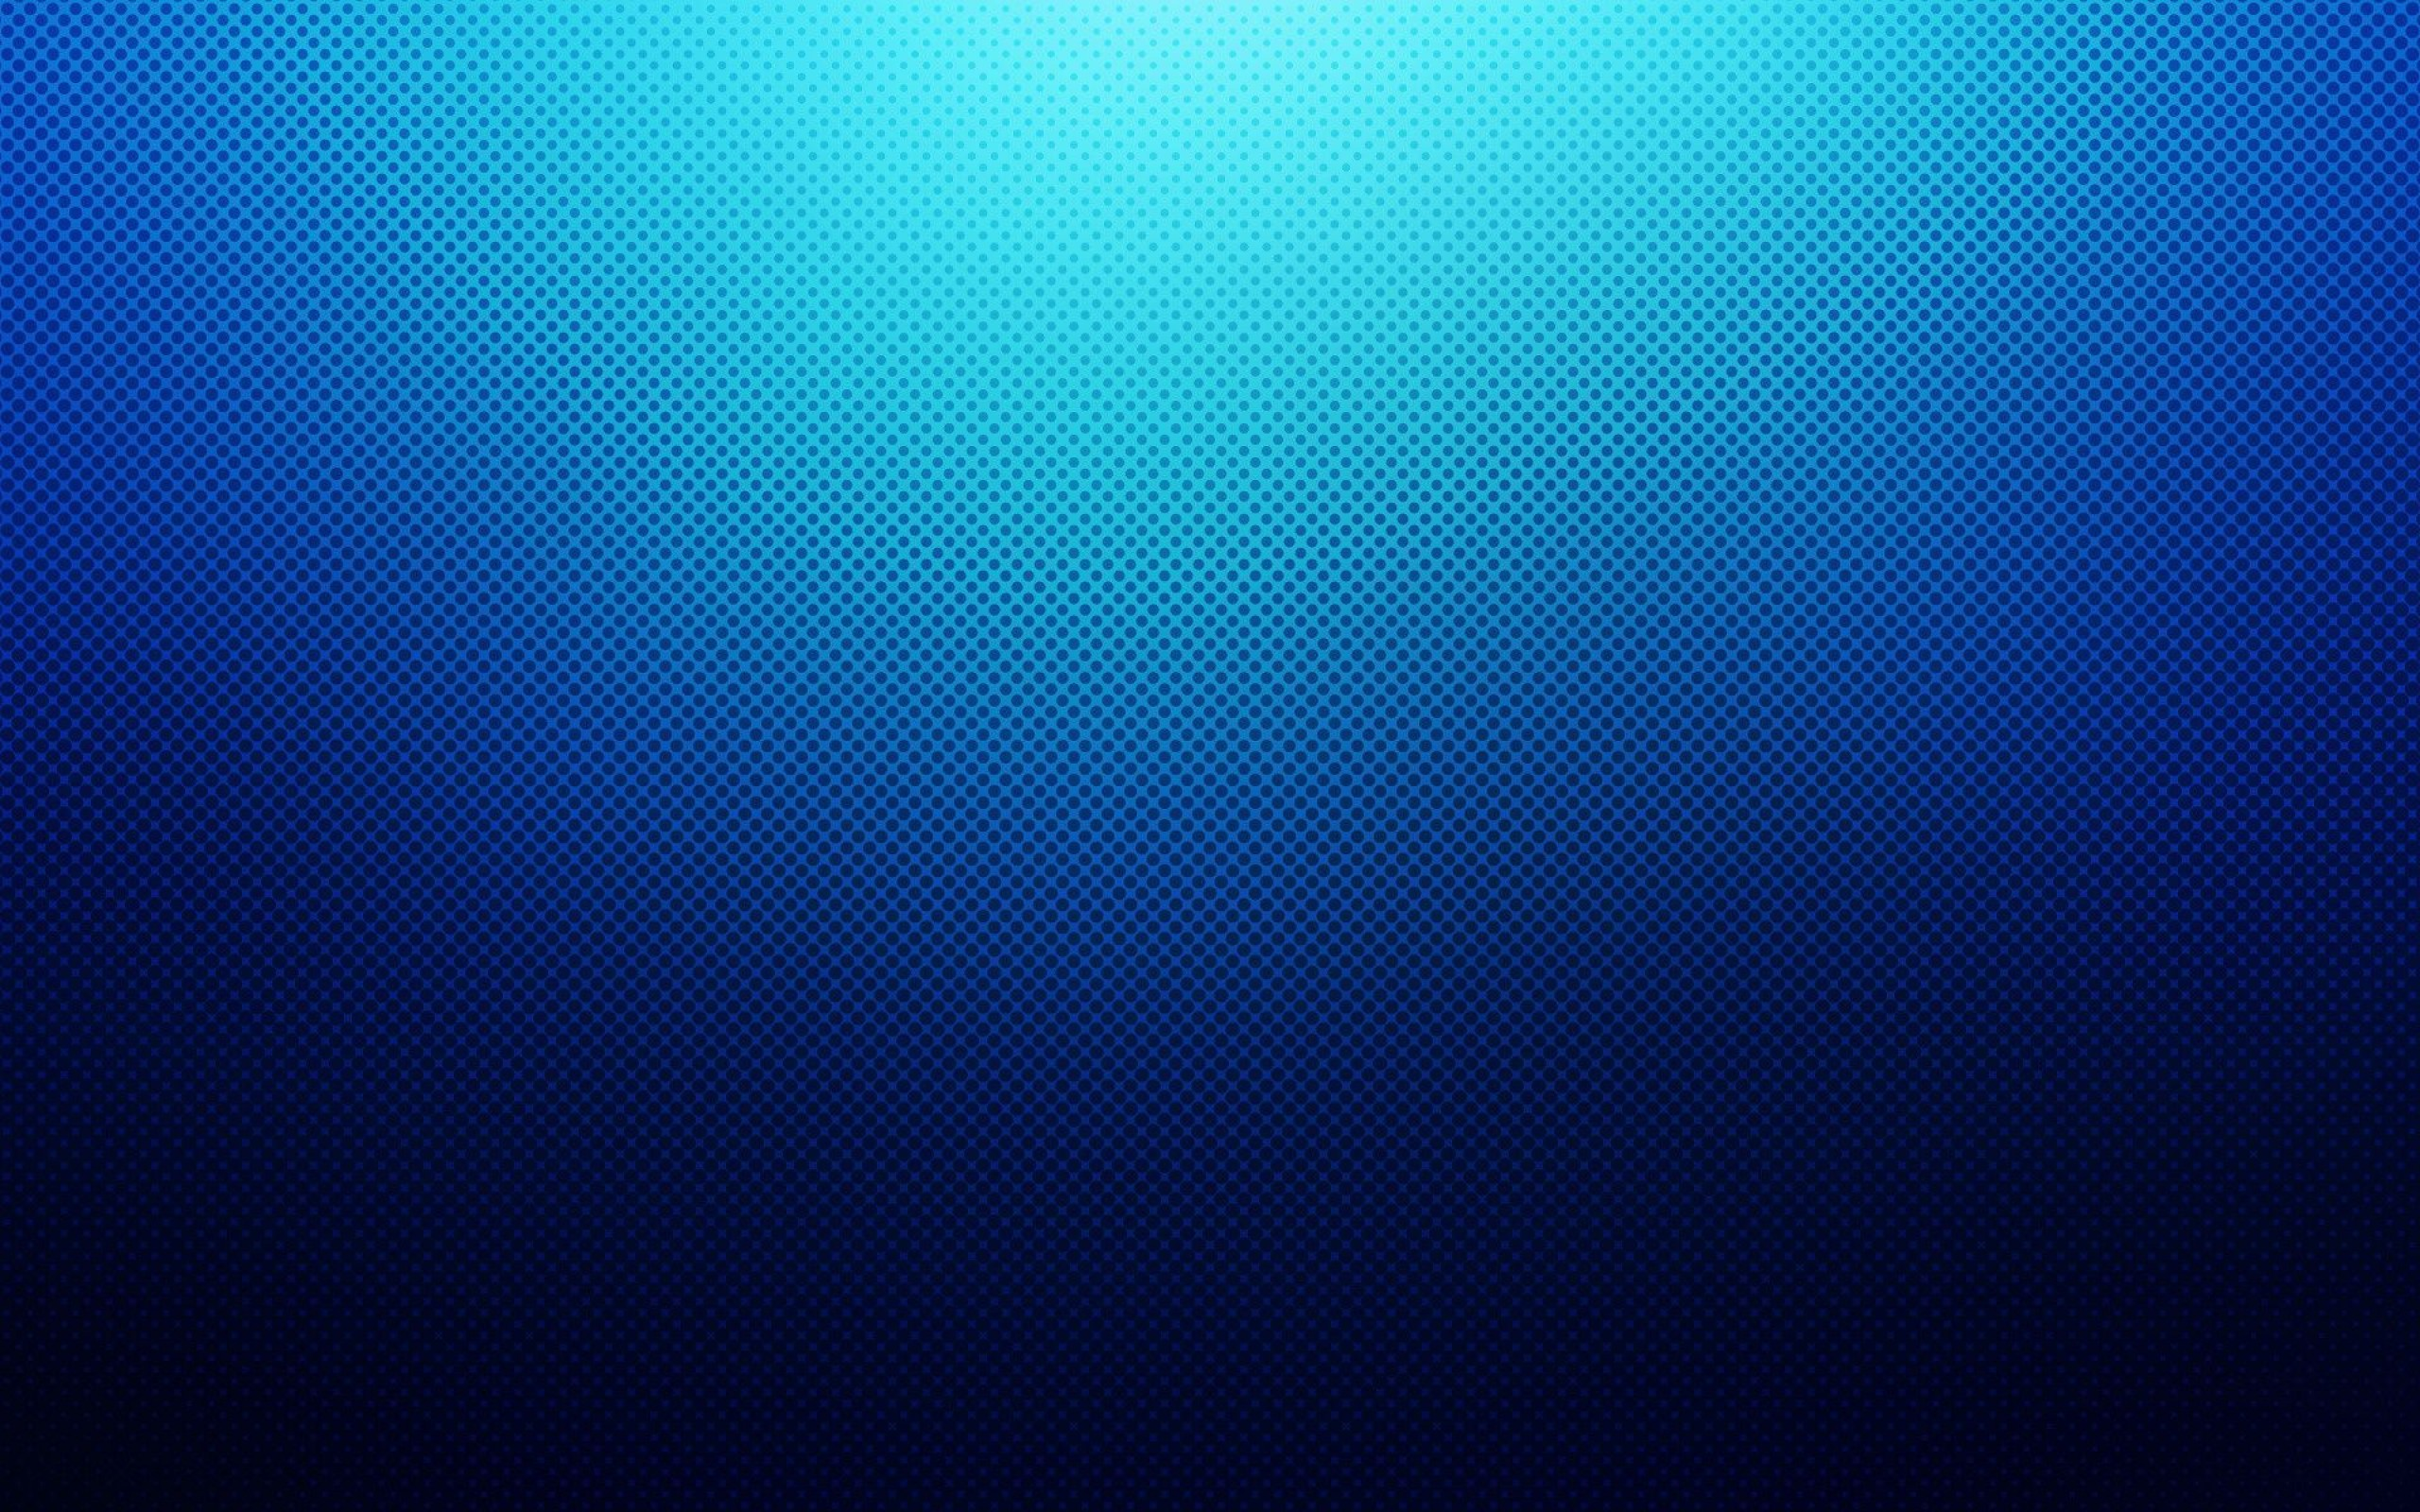 blue background - AirVidTech